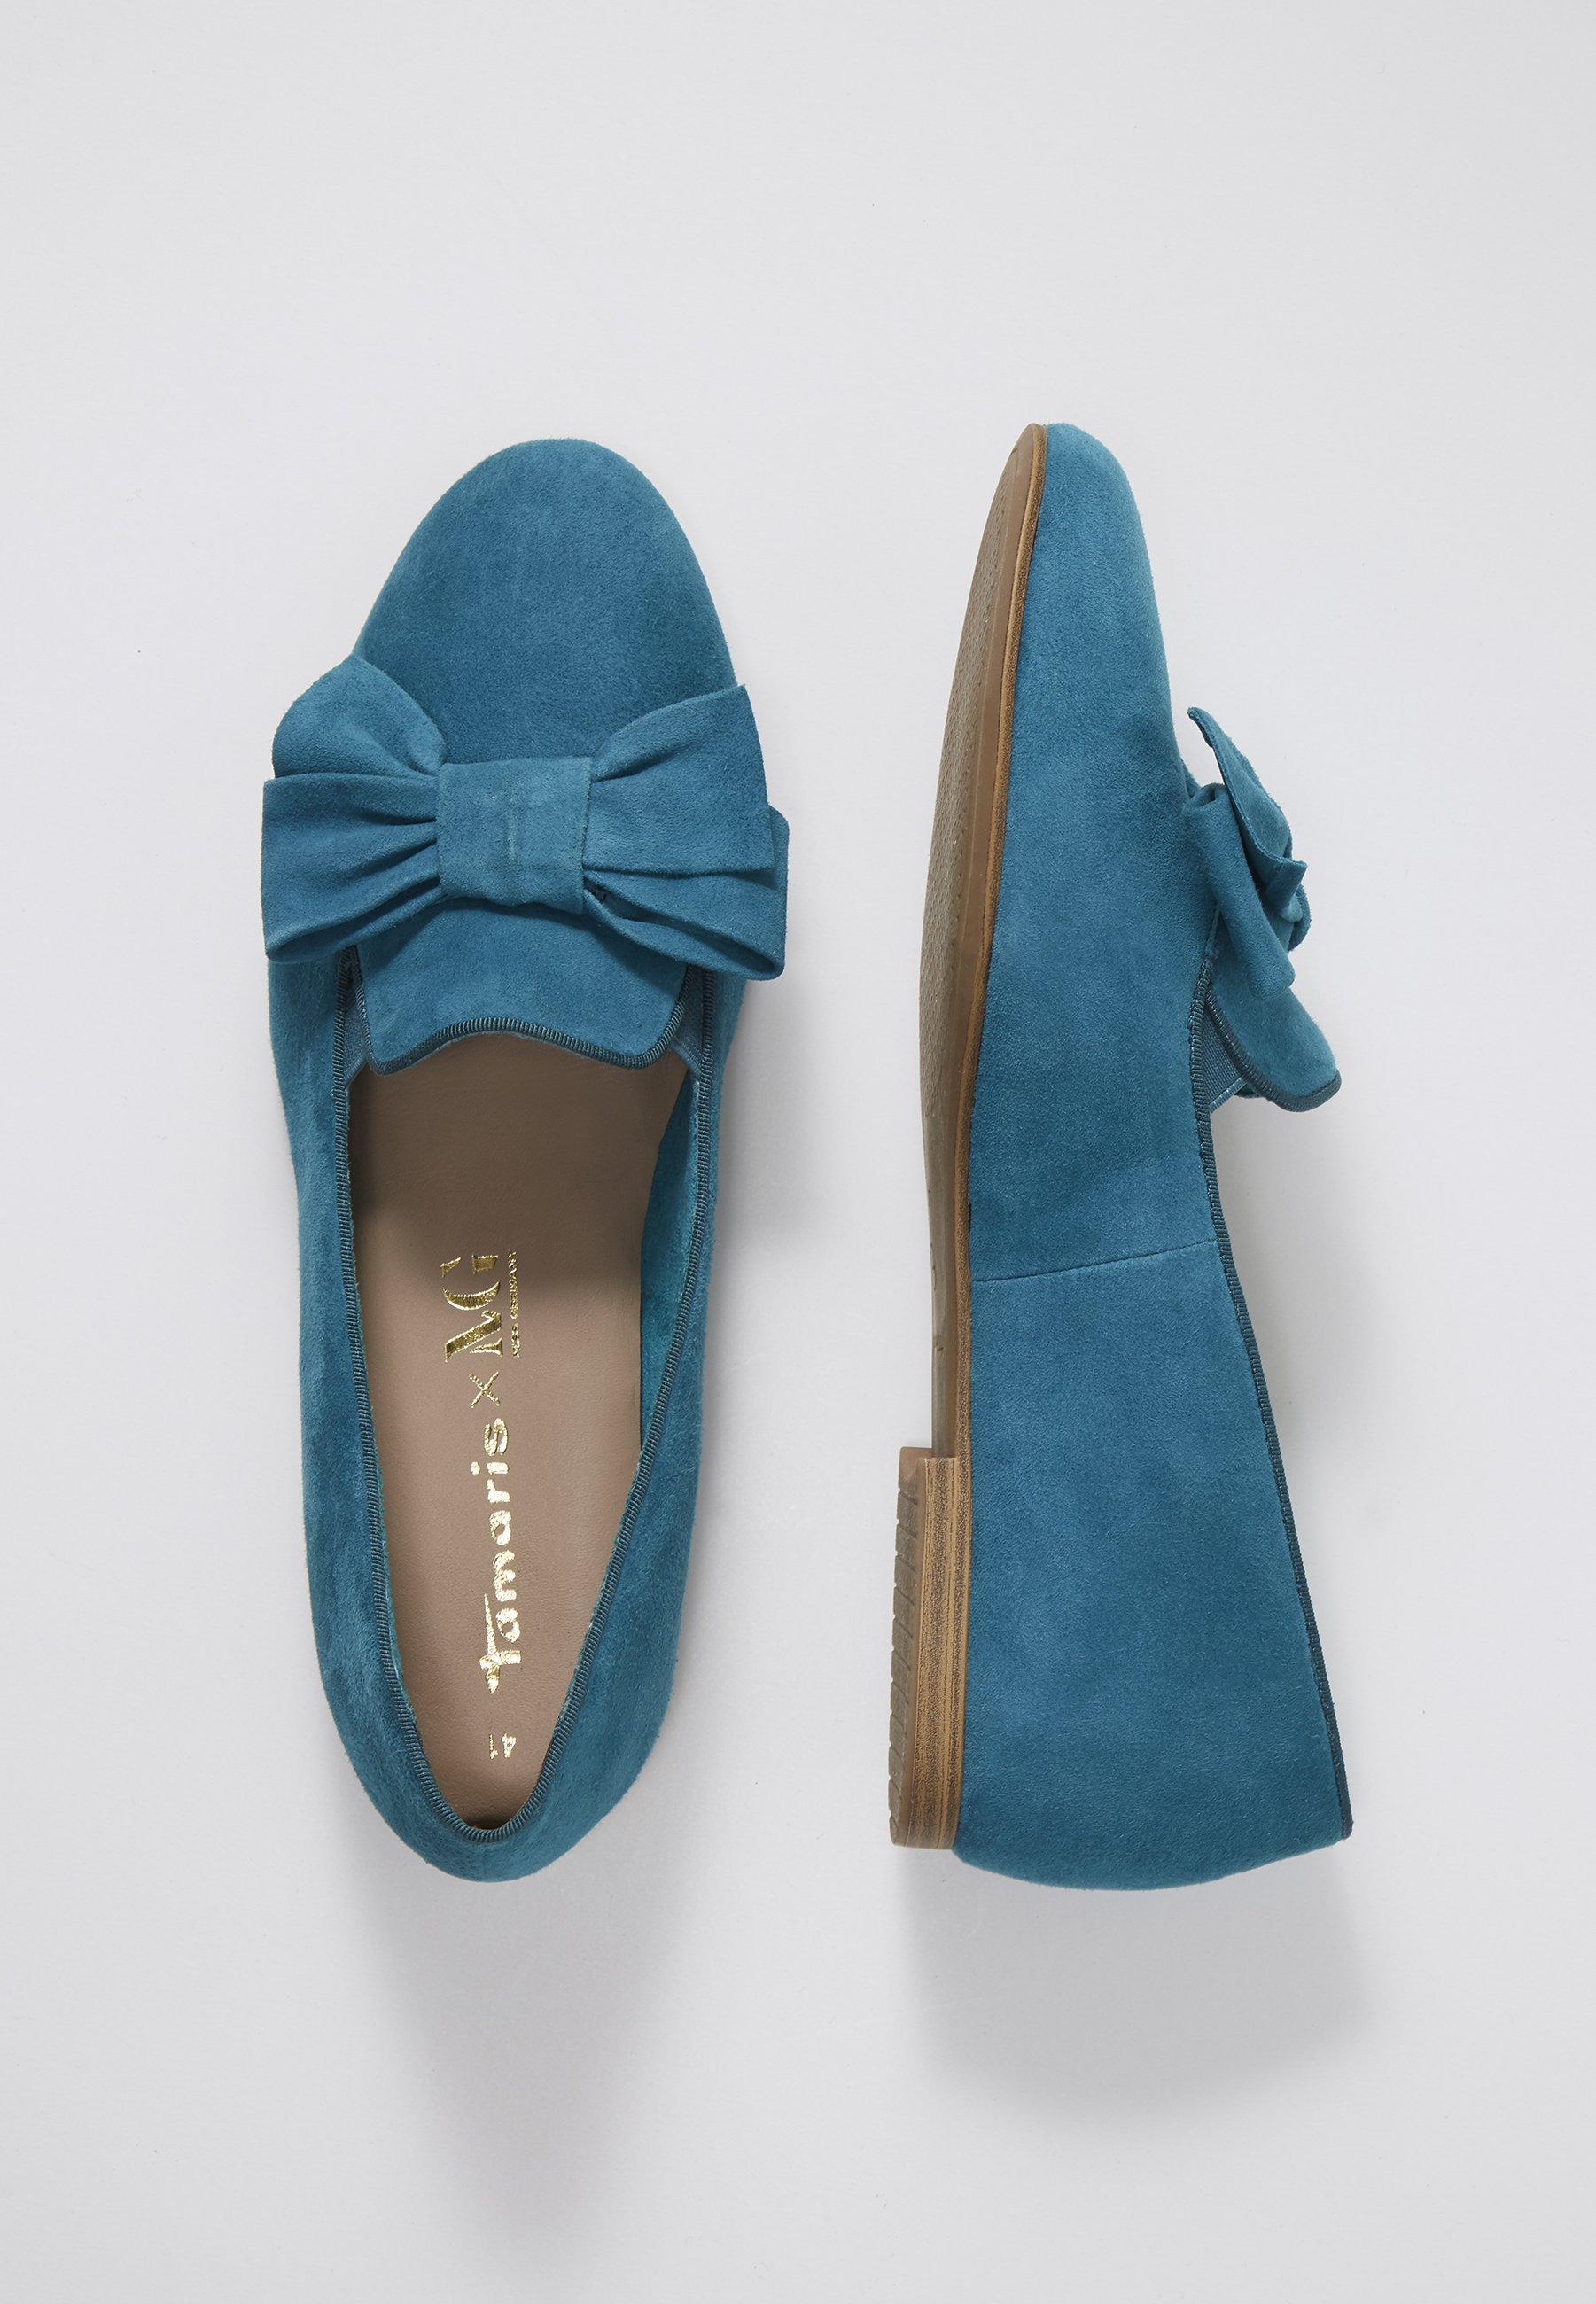 Tamaris WOMS X MISS GERMANY KOLLEKTION - Półbuty wsuwane - turquoise